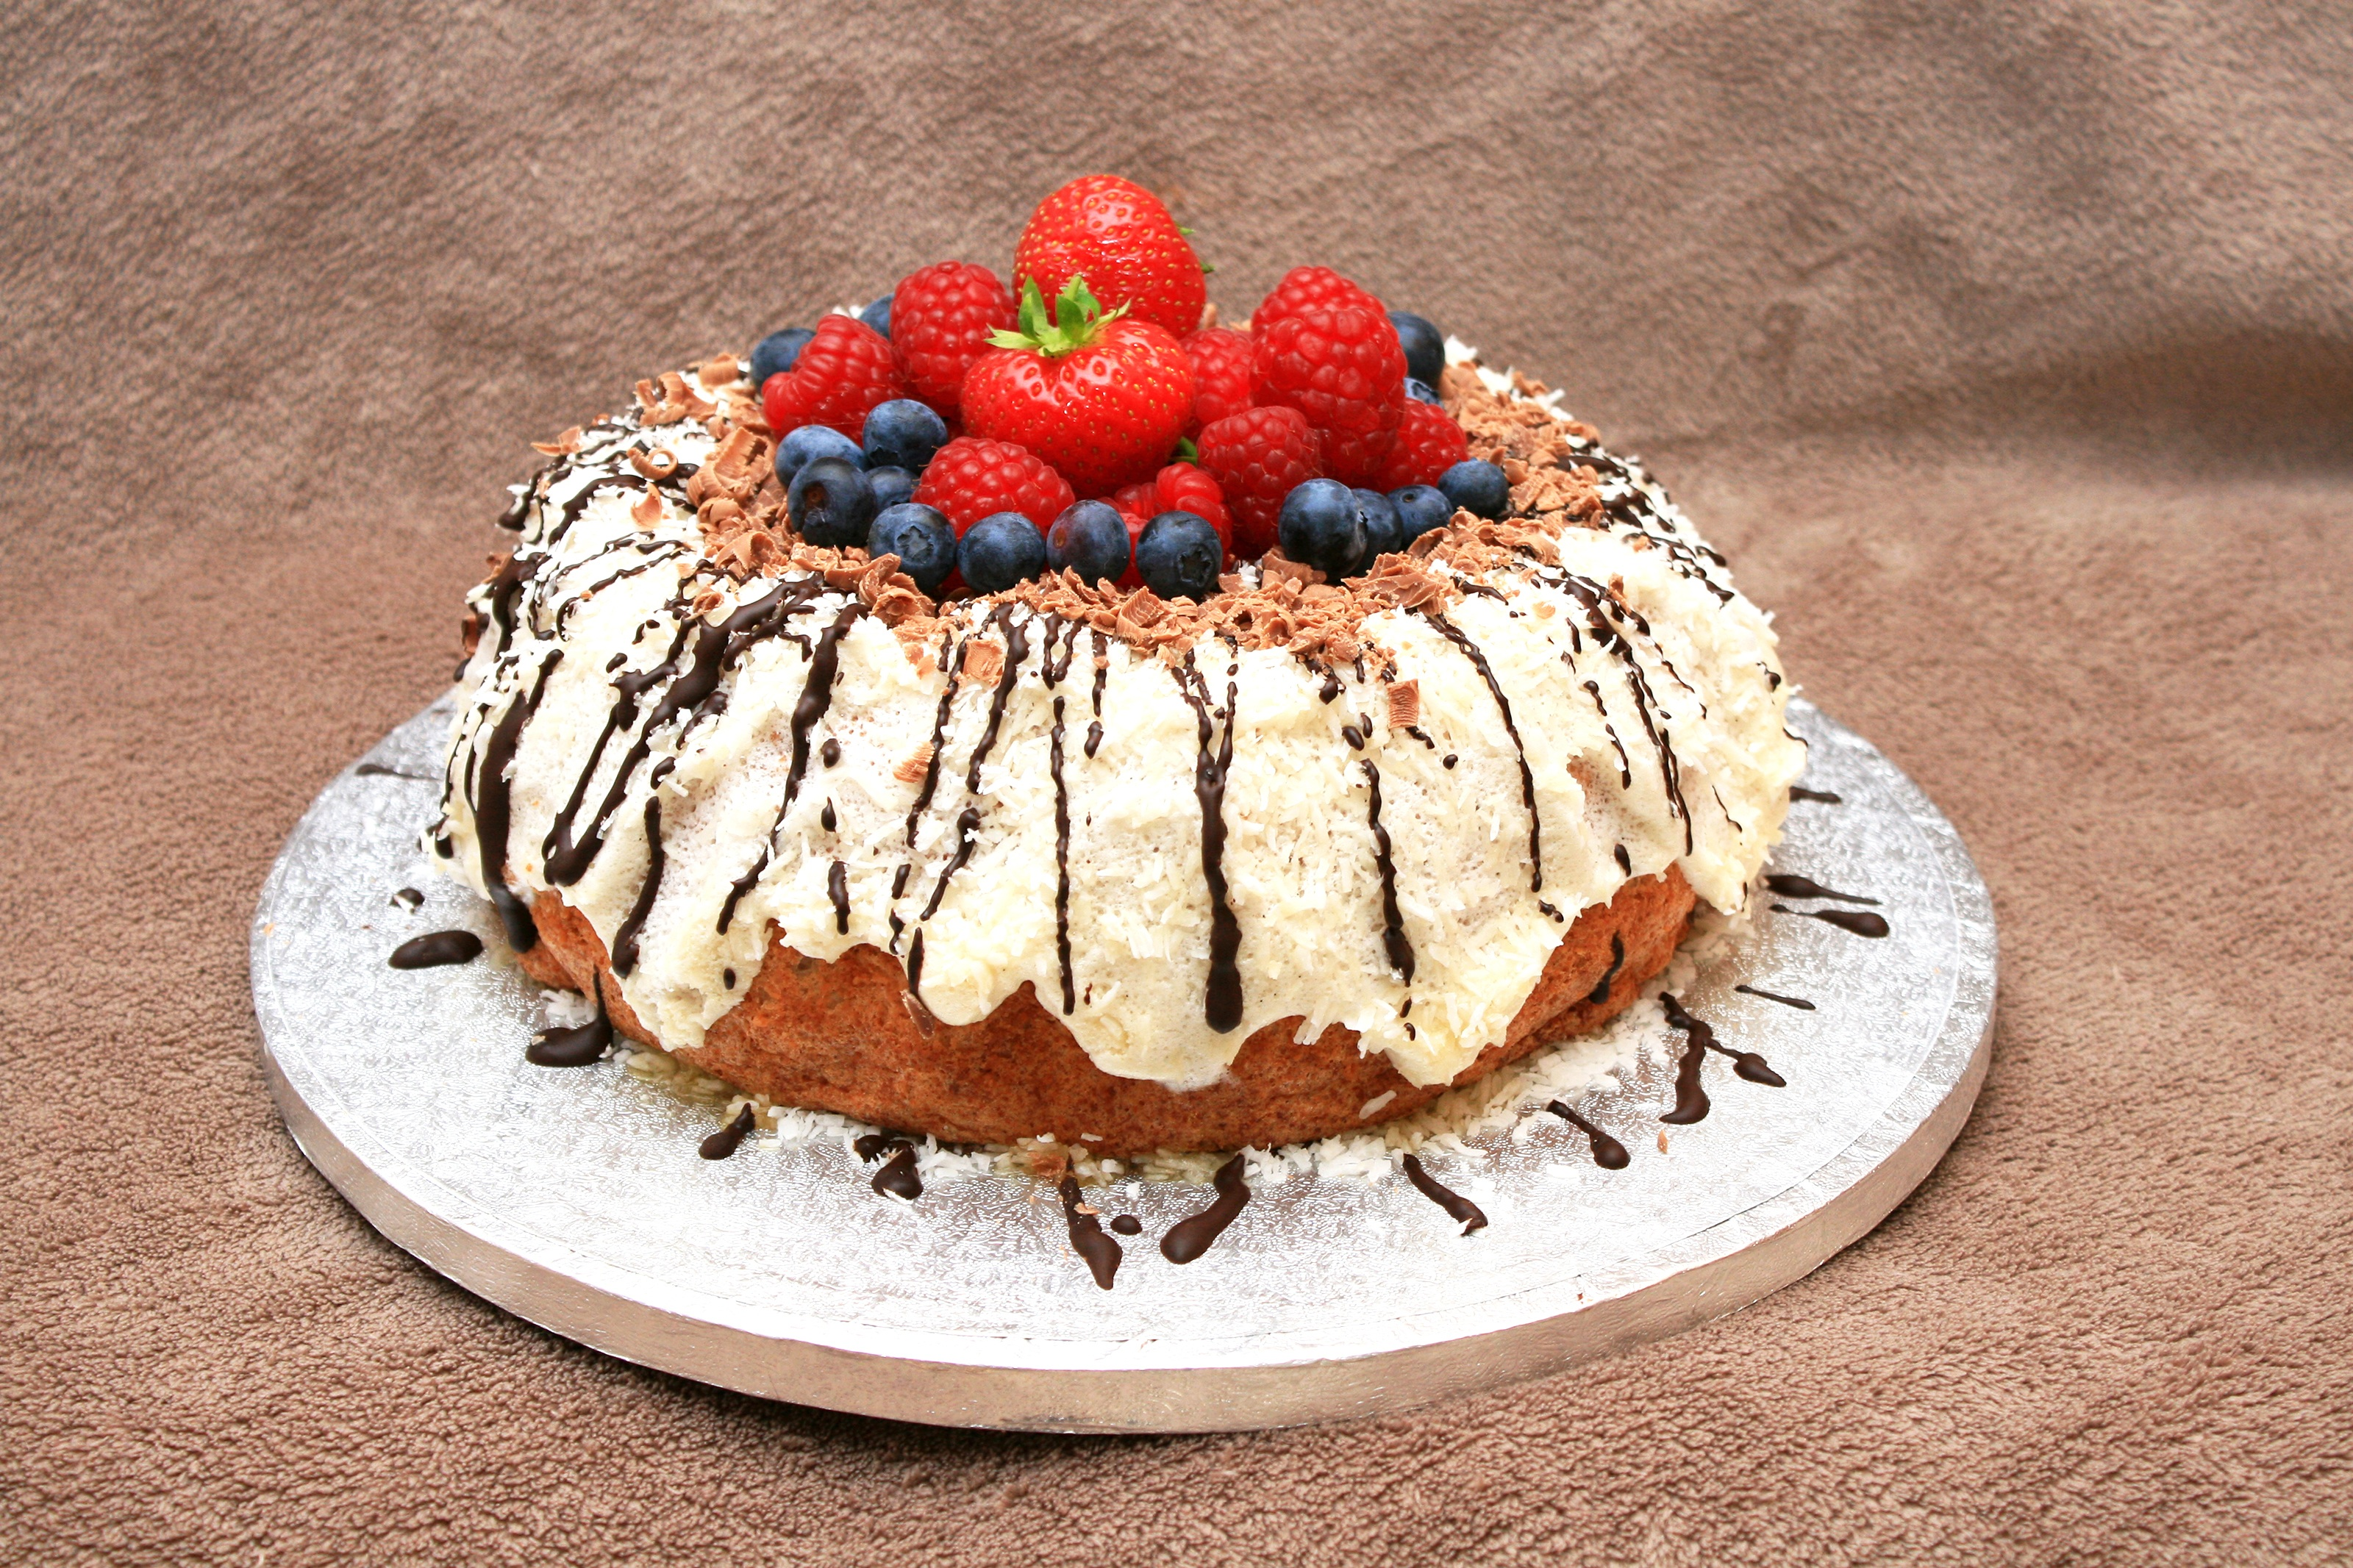 торт пирог  № 1406576 без смс